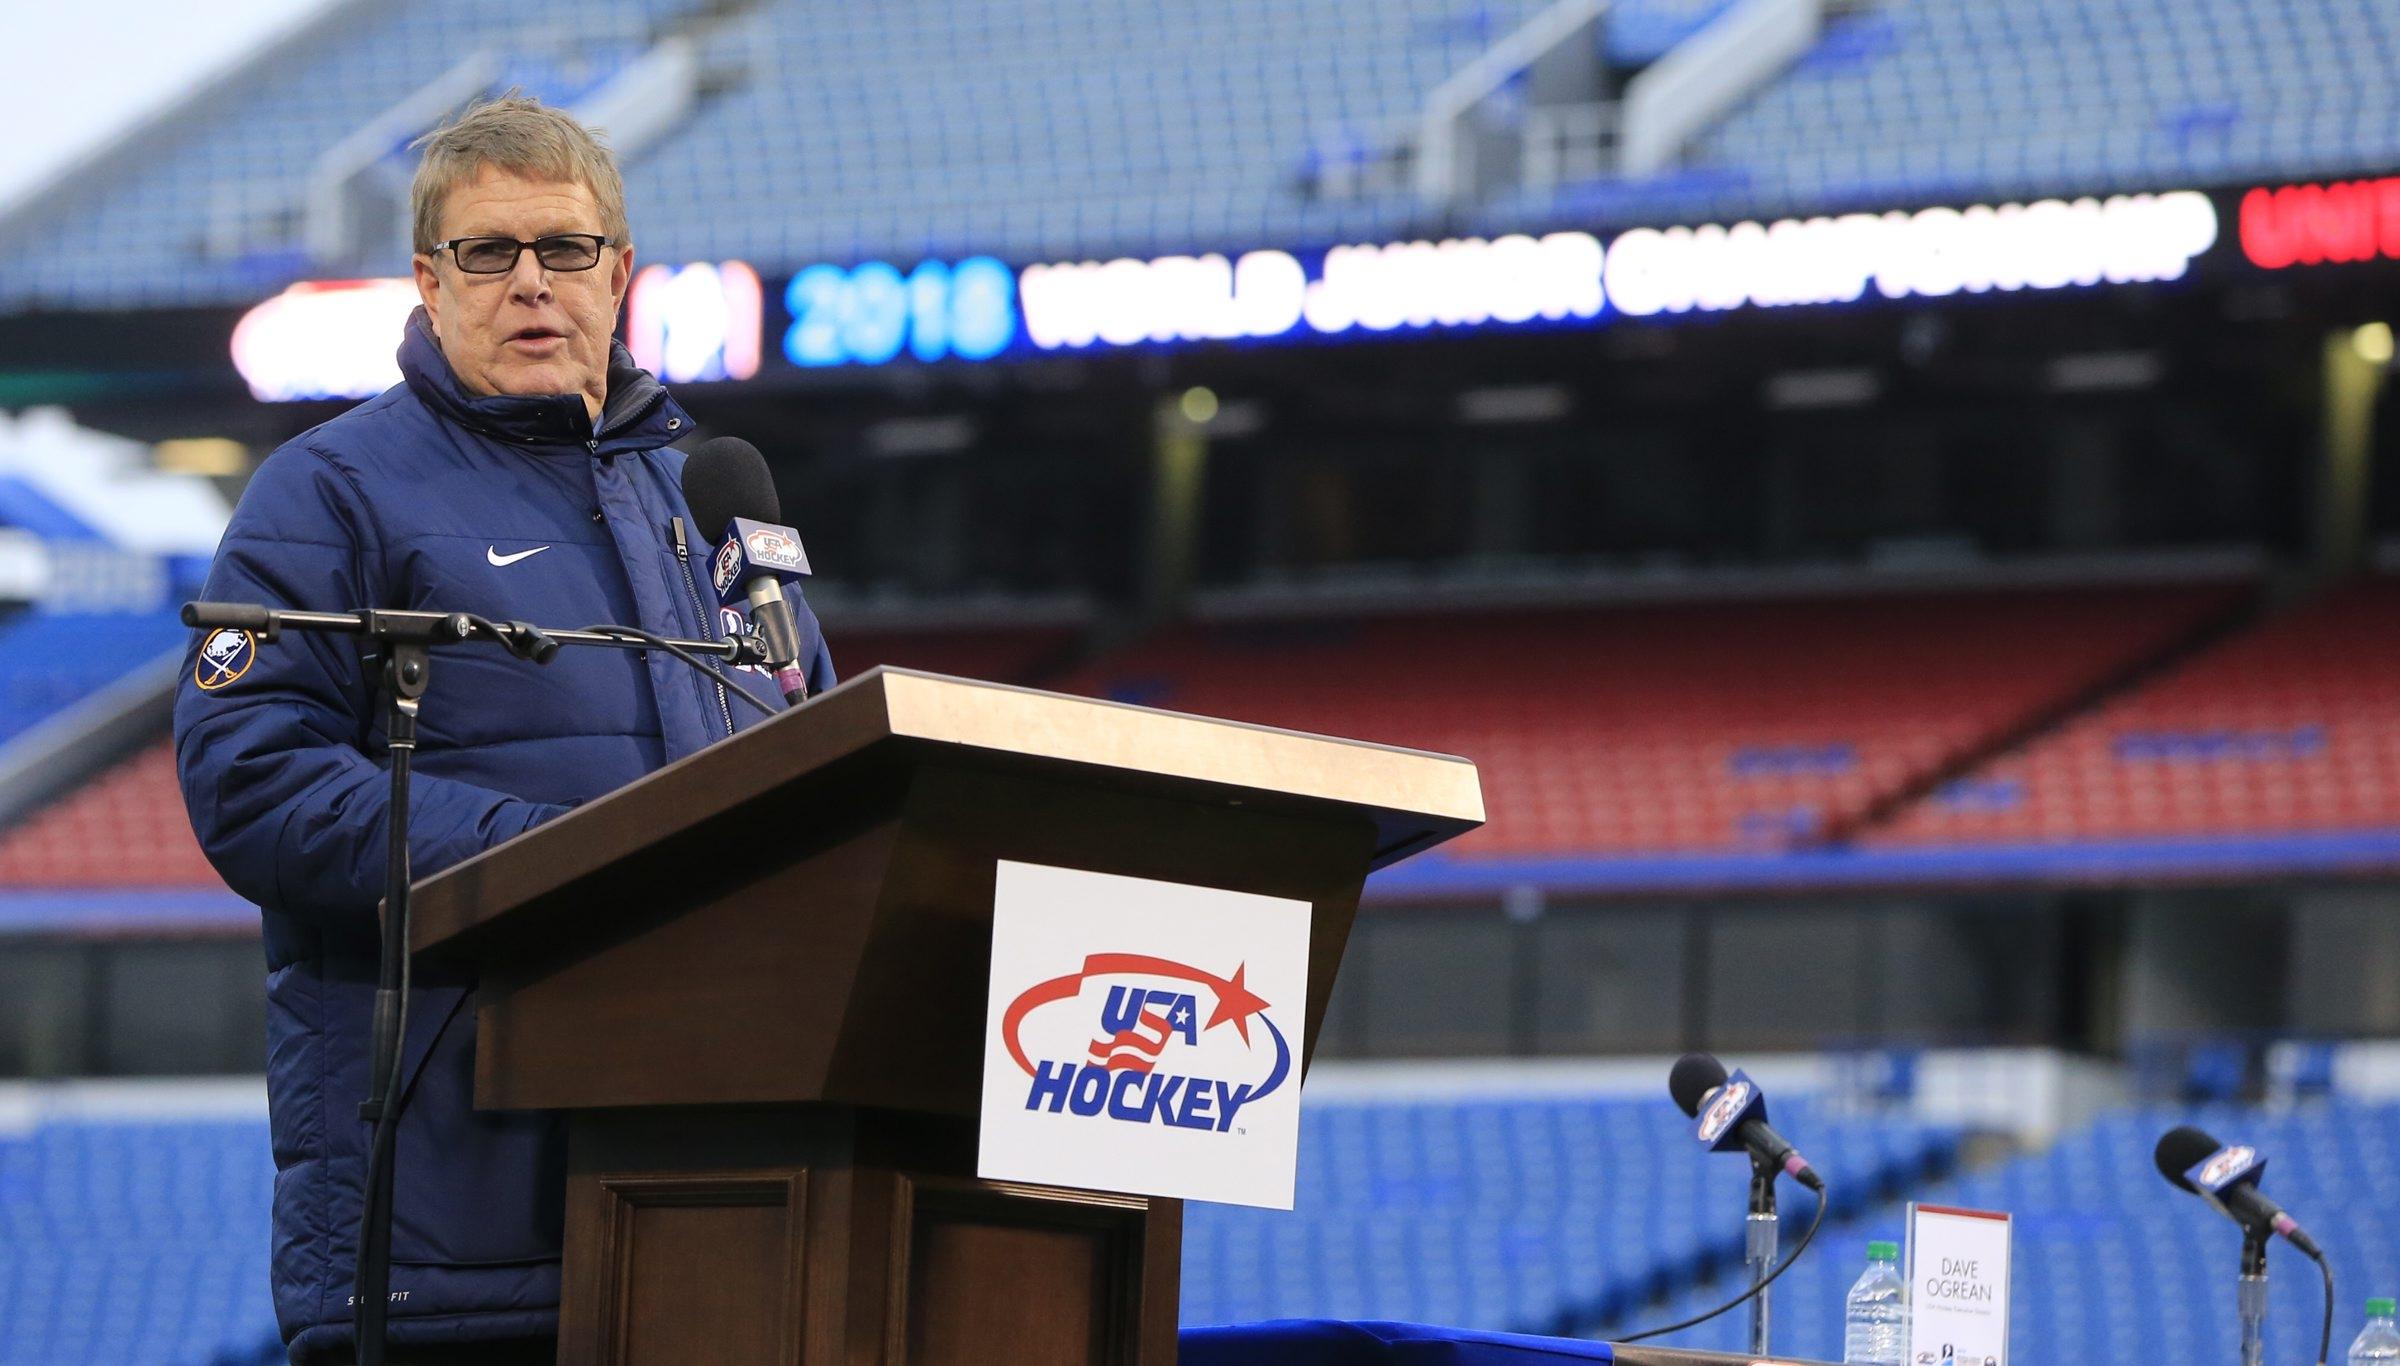 Dave Ogrean, executive director of USA Hockey, announces that Buffalo has been awarded the 2018 World Juniors hockey tournament.